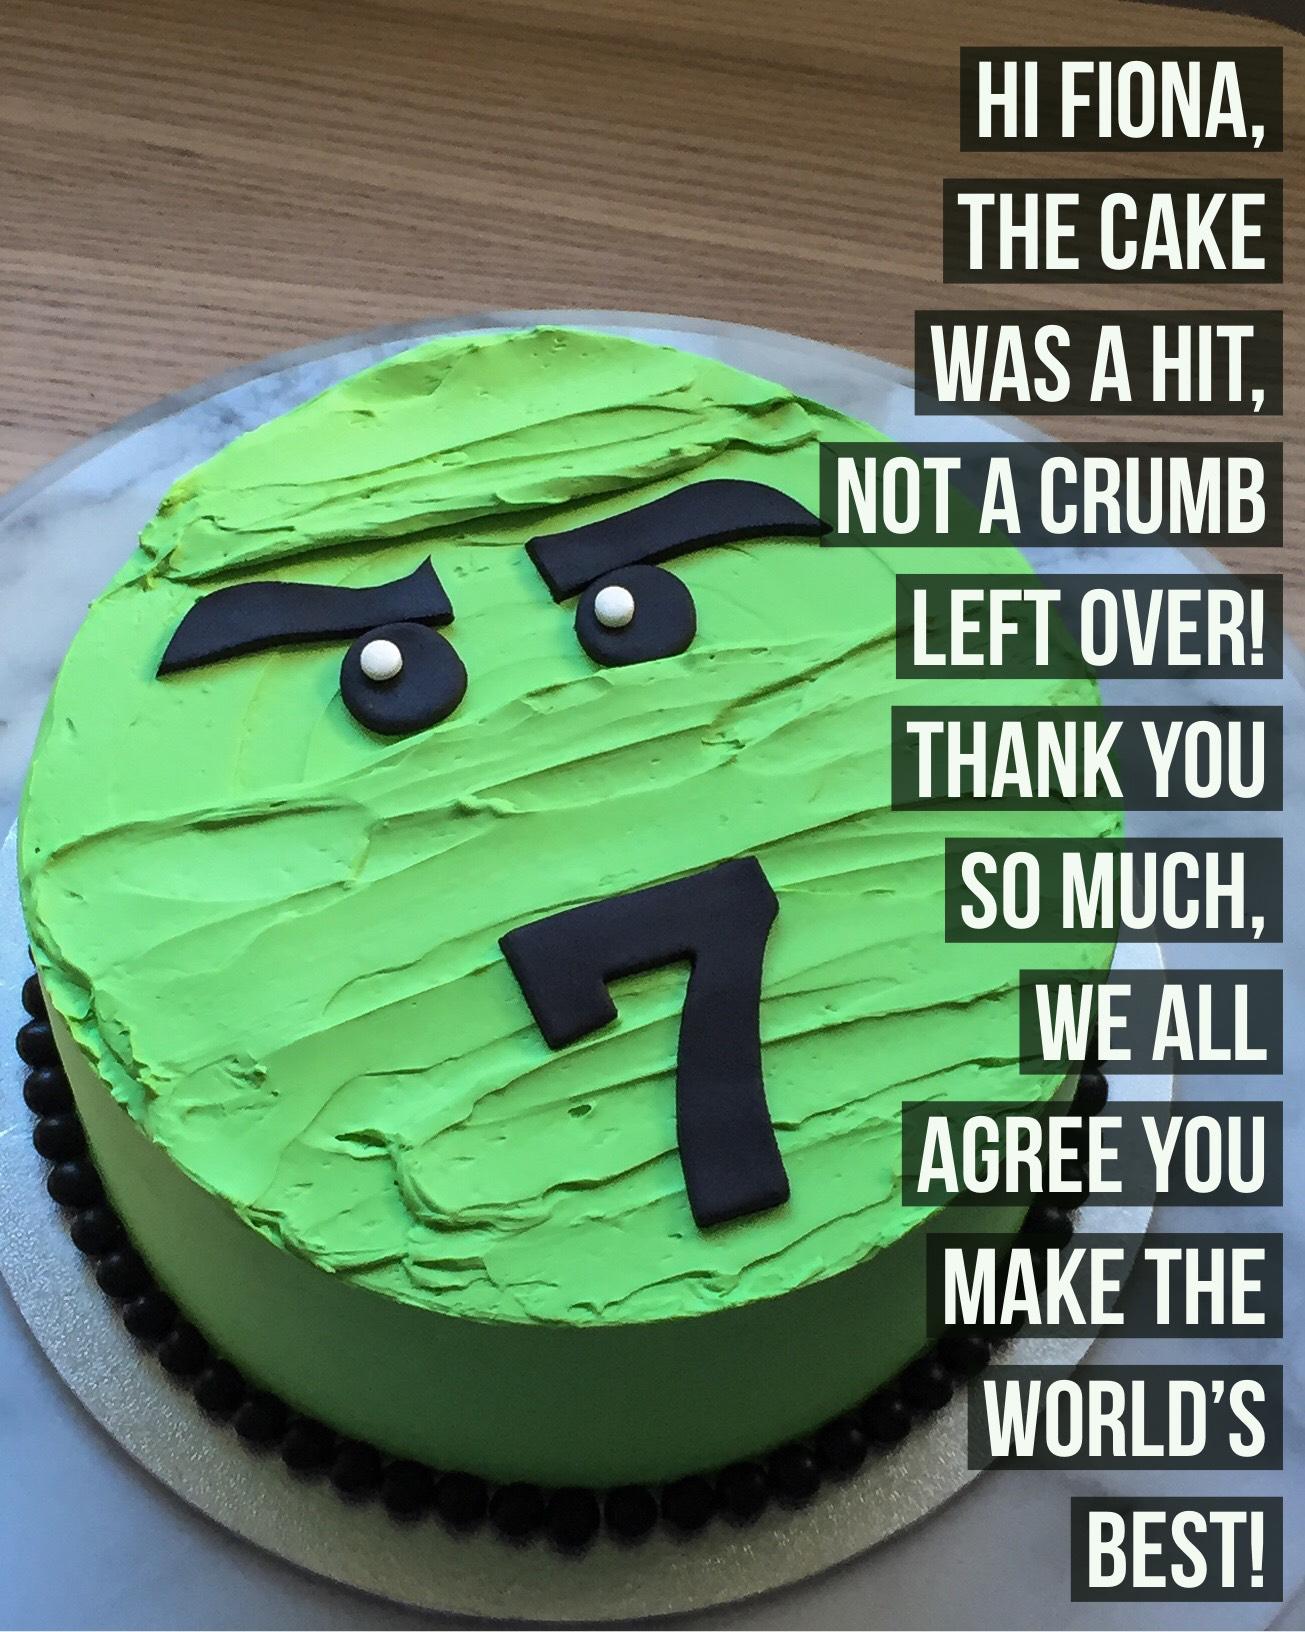 Sydney Cakes, Baked By Fiona 7th green novelty cake